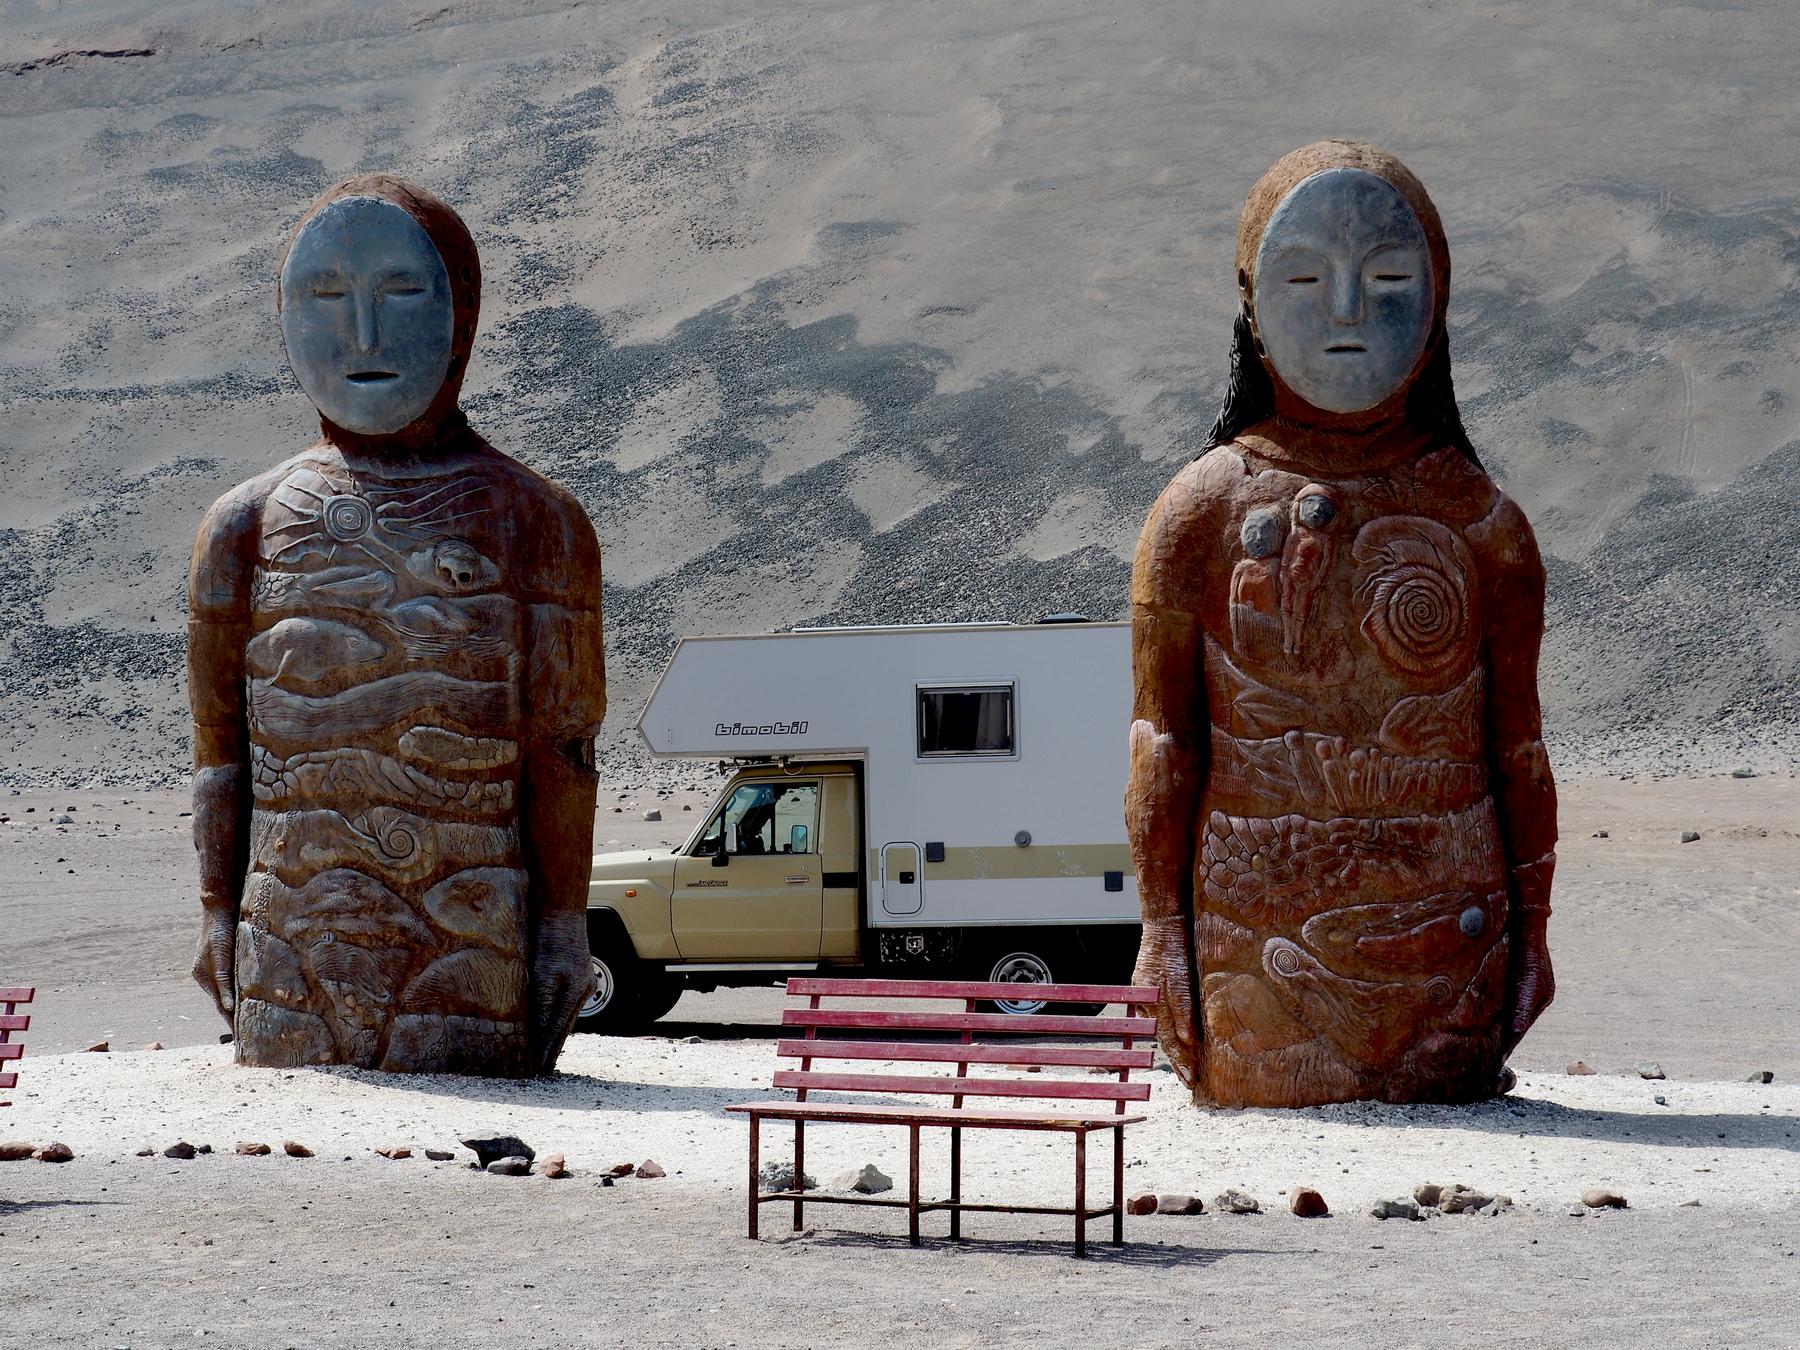 Den ältesten bekannten Mumien nachgebildet